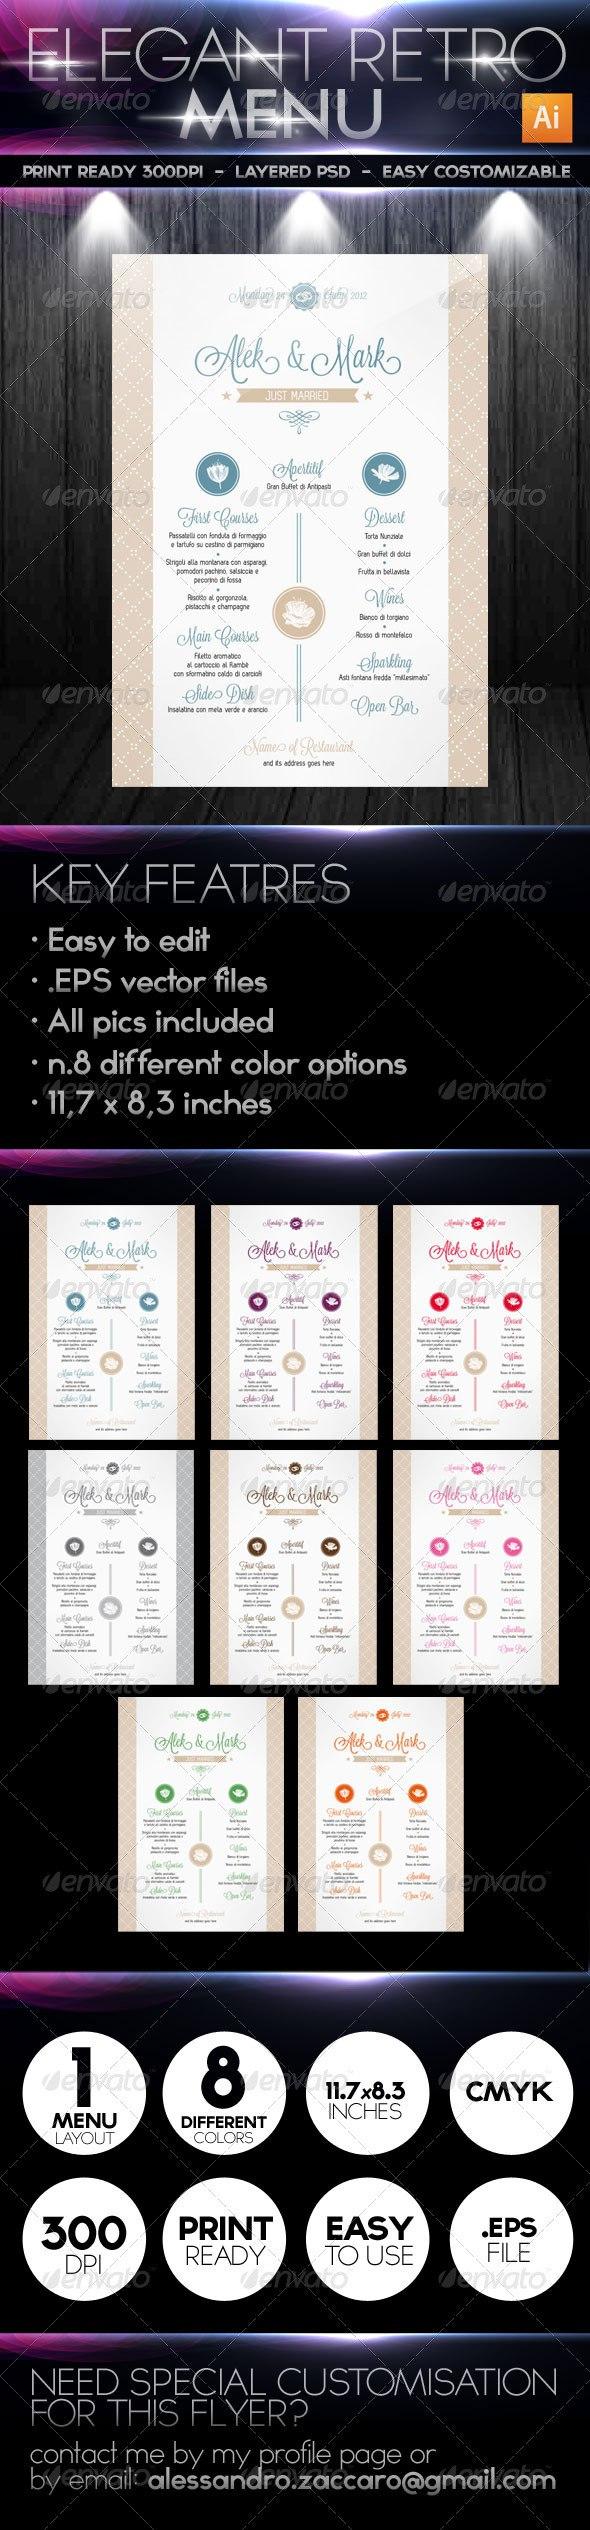 Premium Restaurant Menu Templates  Dzineflip In Adobe Illustrator Menu Template